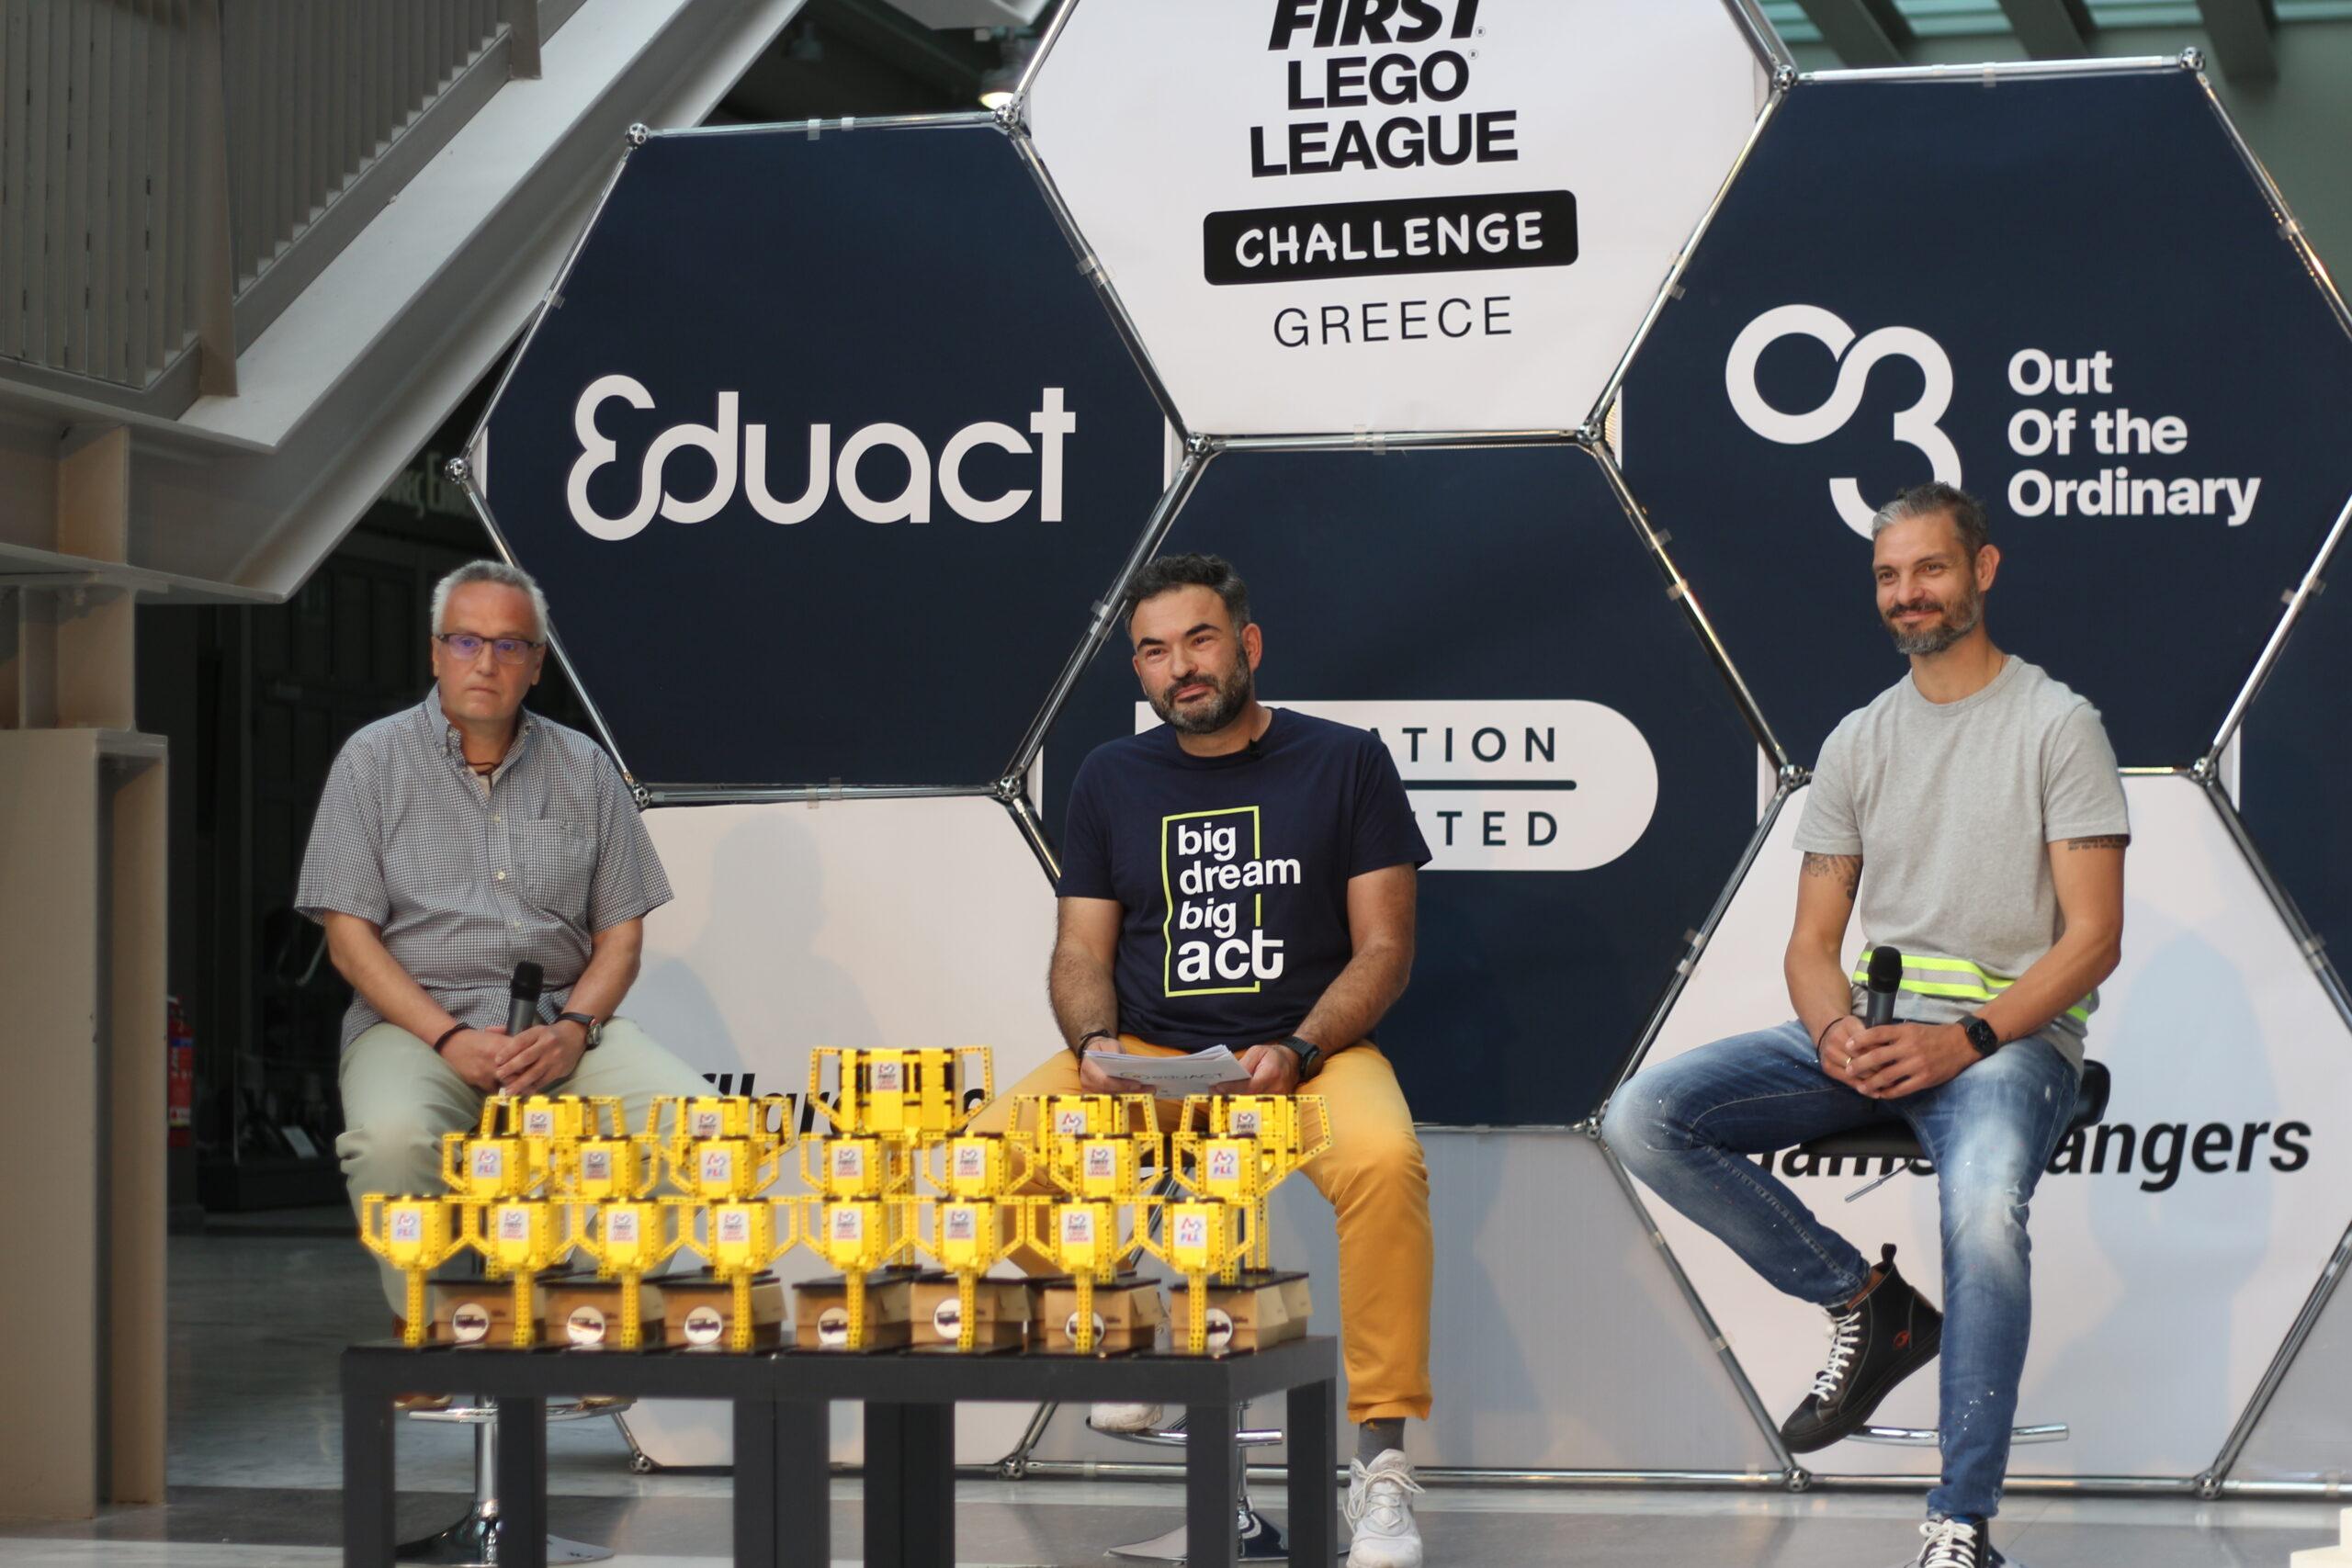 FIRST® LEGO® League Πανελλήνιο Πρωτάθλημα 2021 – Δηλώσεις καλεσμένων